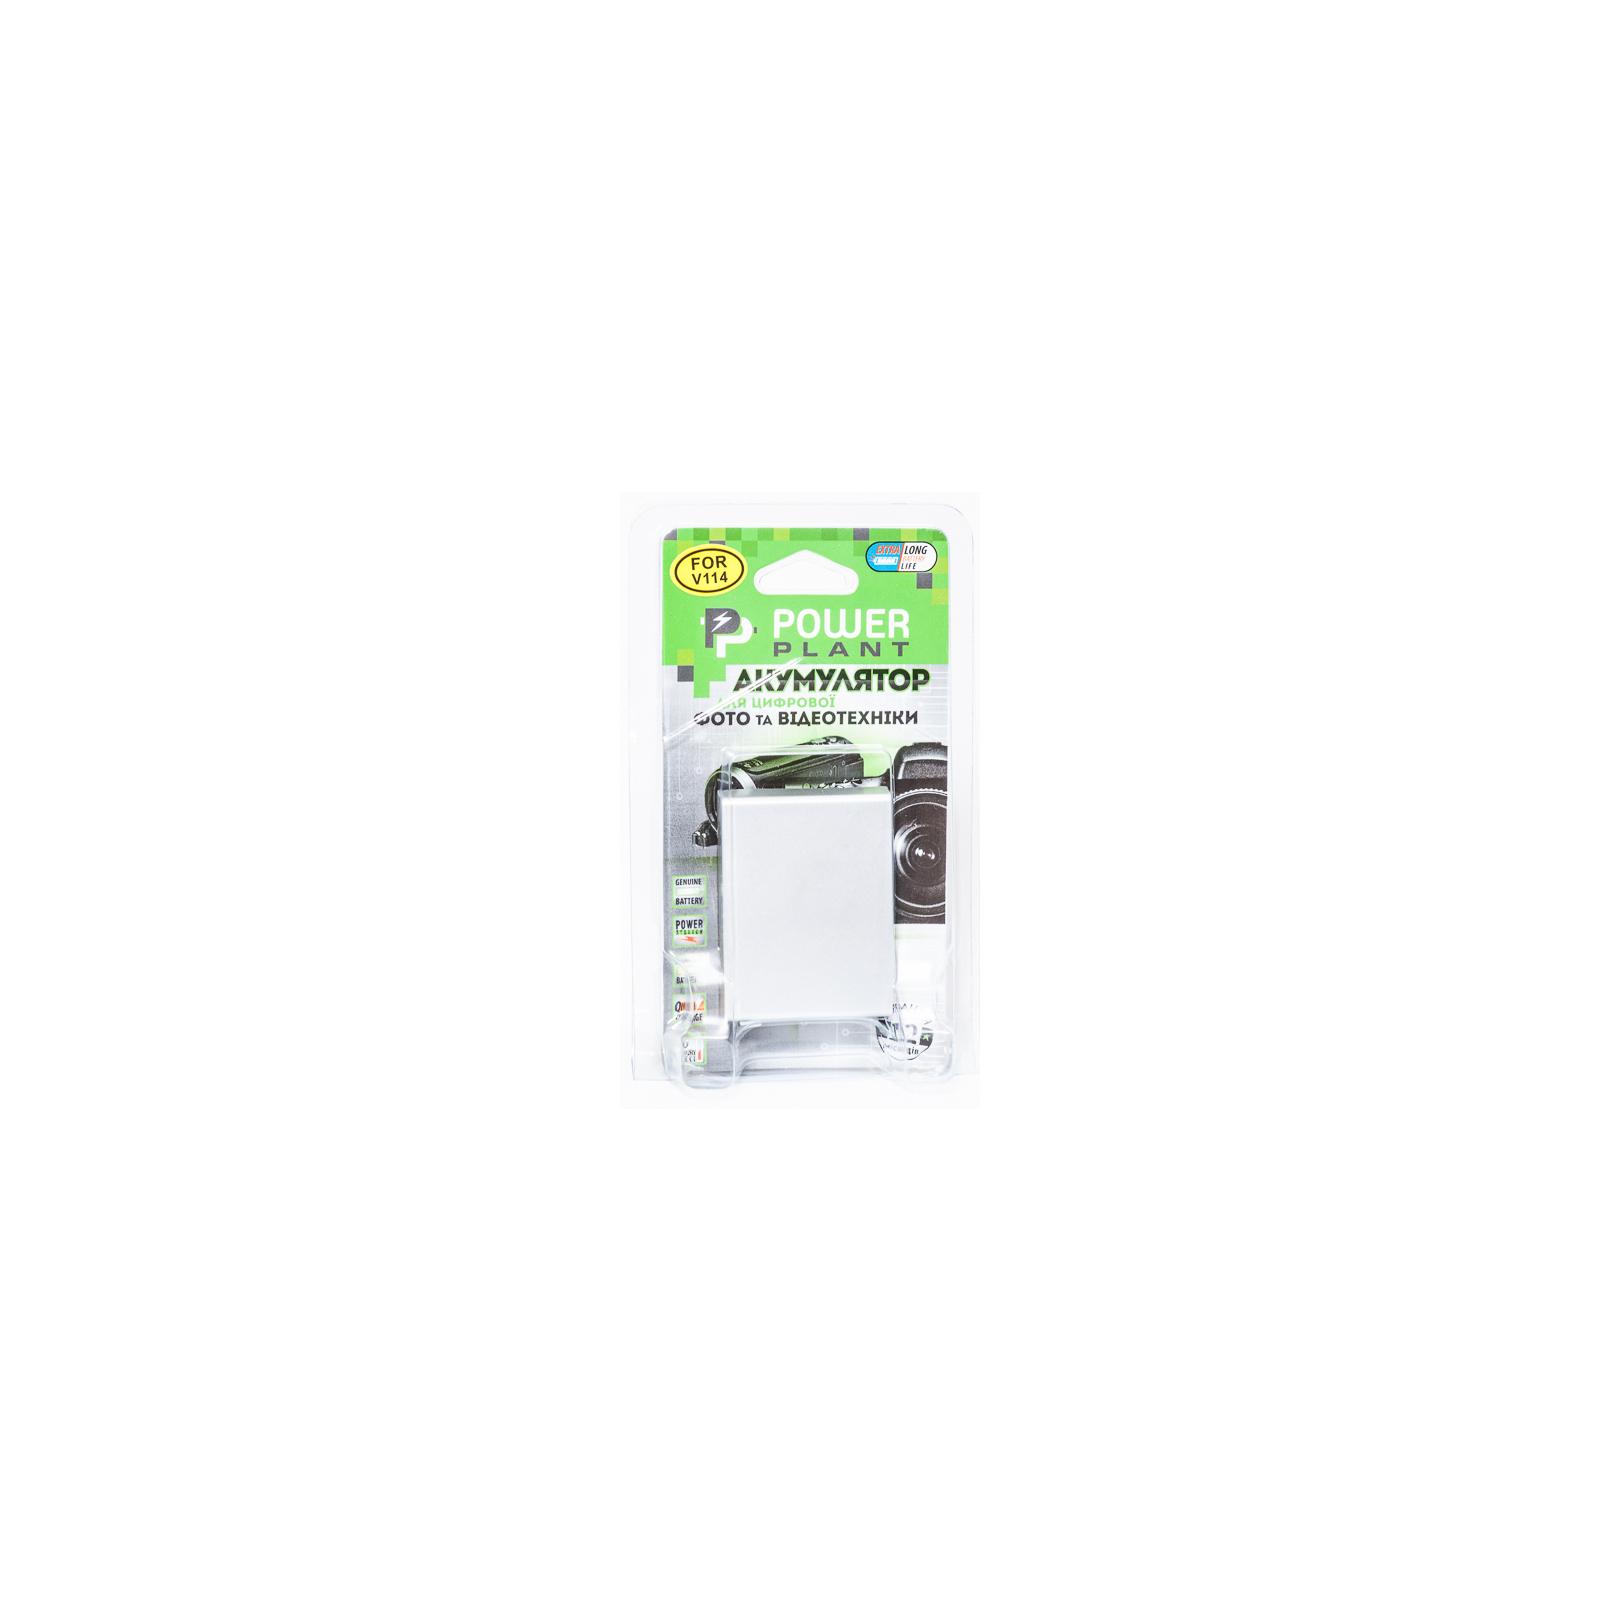 Аккумулятор к фото/видео PowerPlant JVC BN-V114U (DV00DV1356) изображение 3